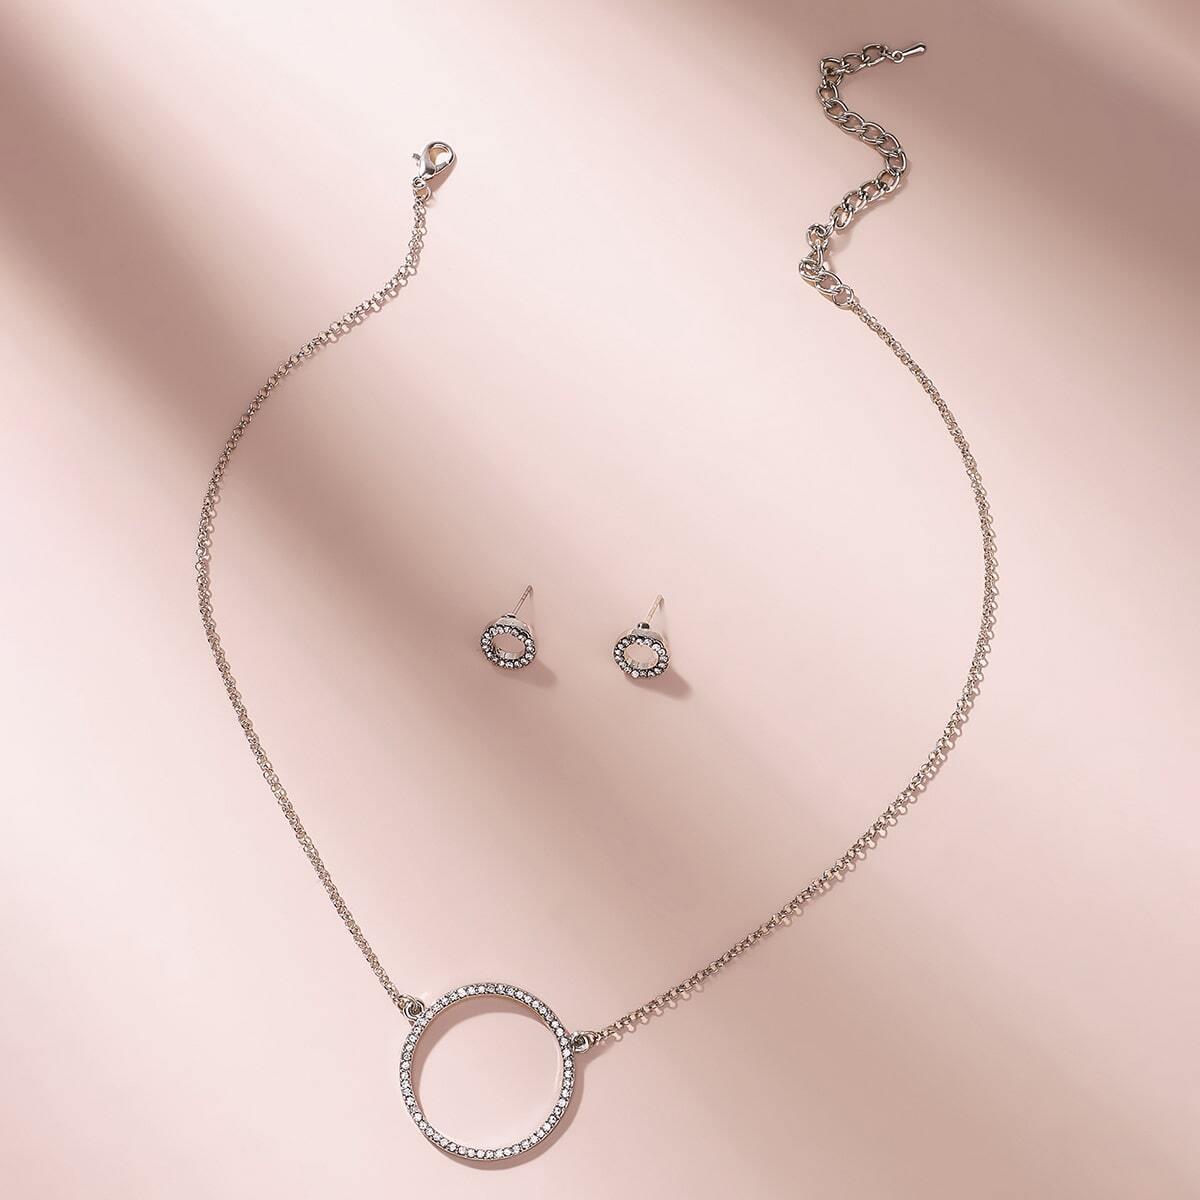 Strass Runde Charm Halskette & Ohrring Set 3pcs